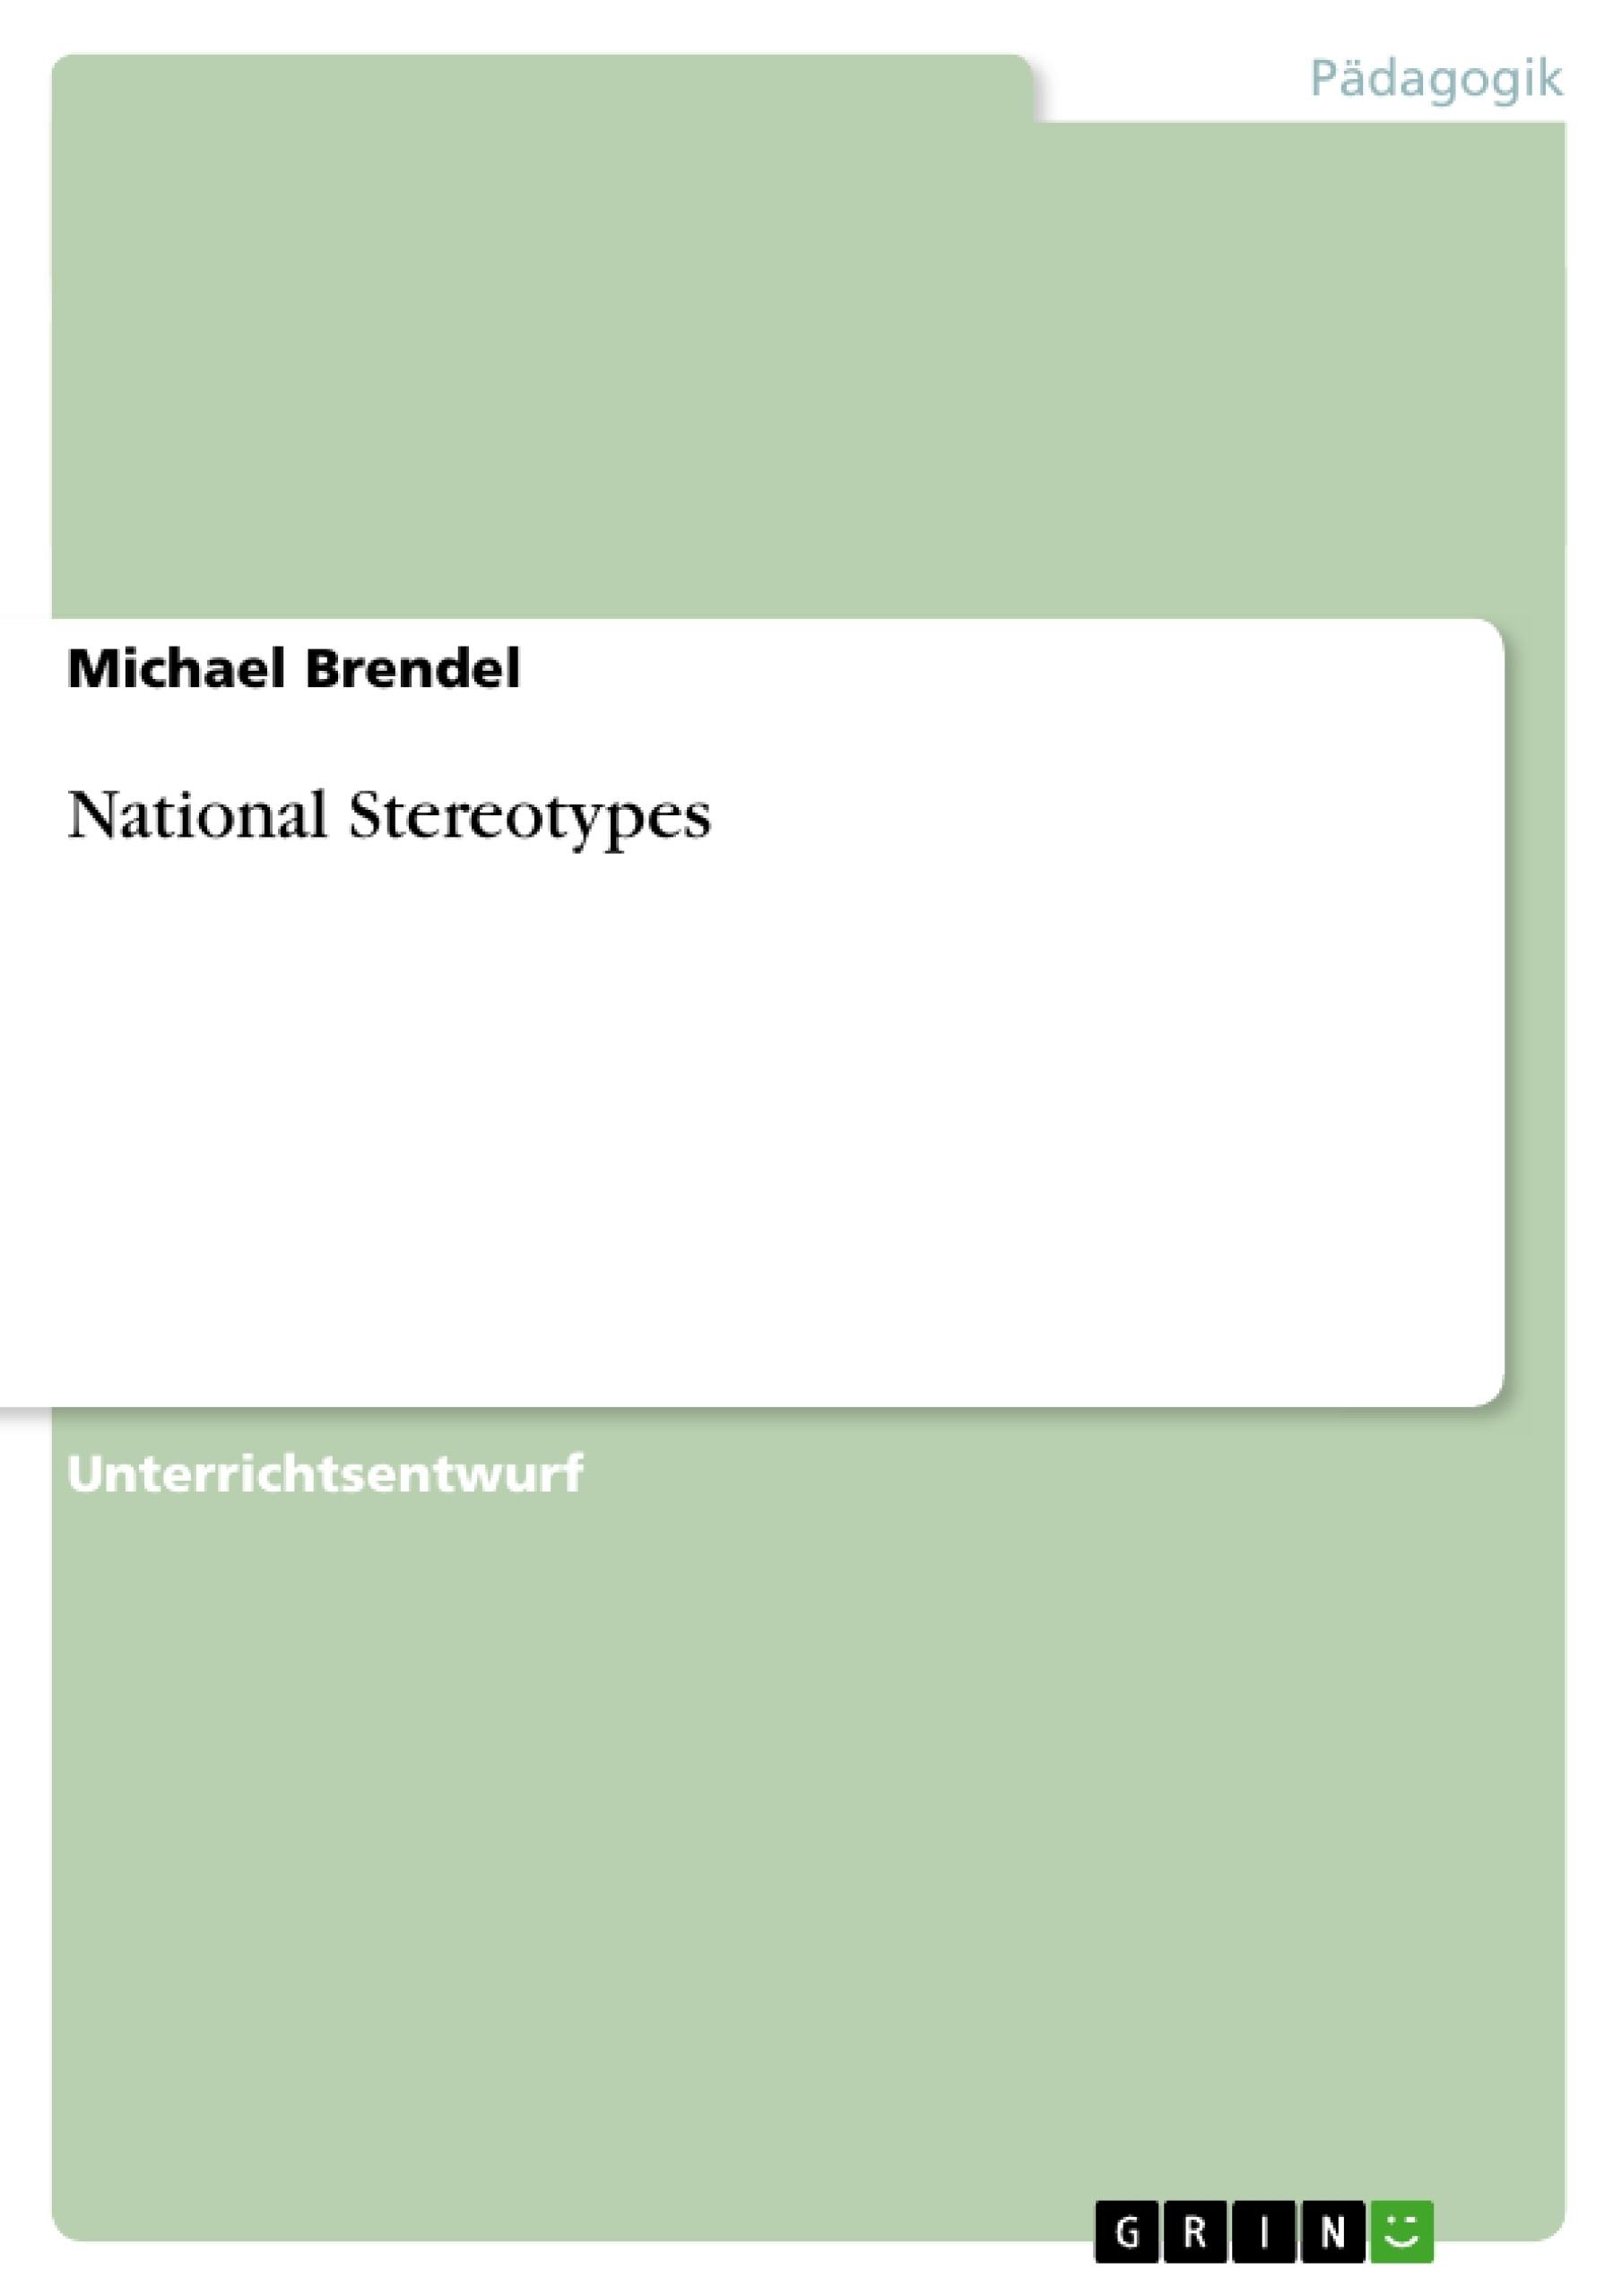 Titel: National Stereotypes